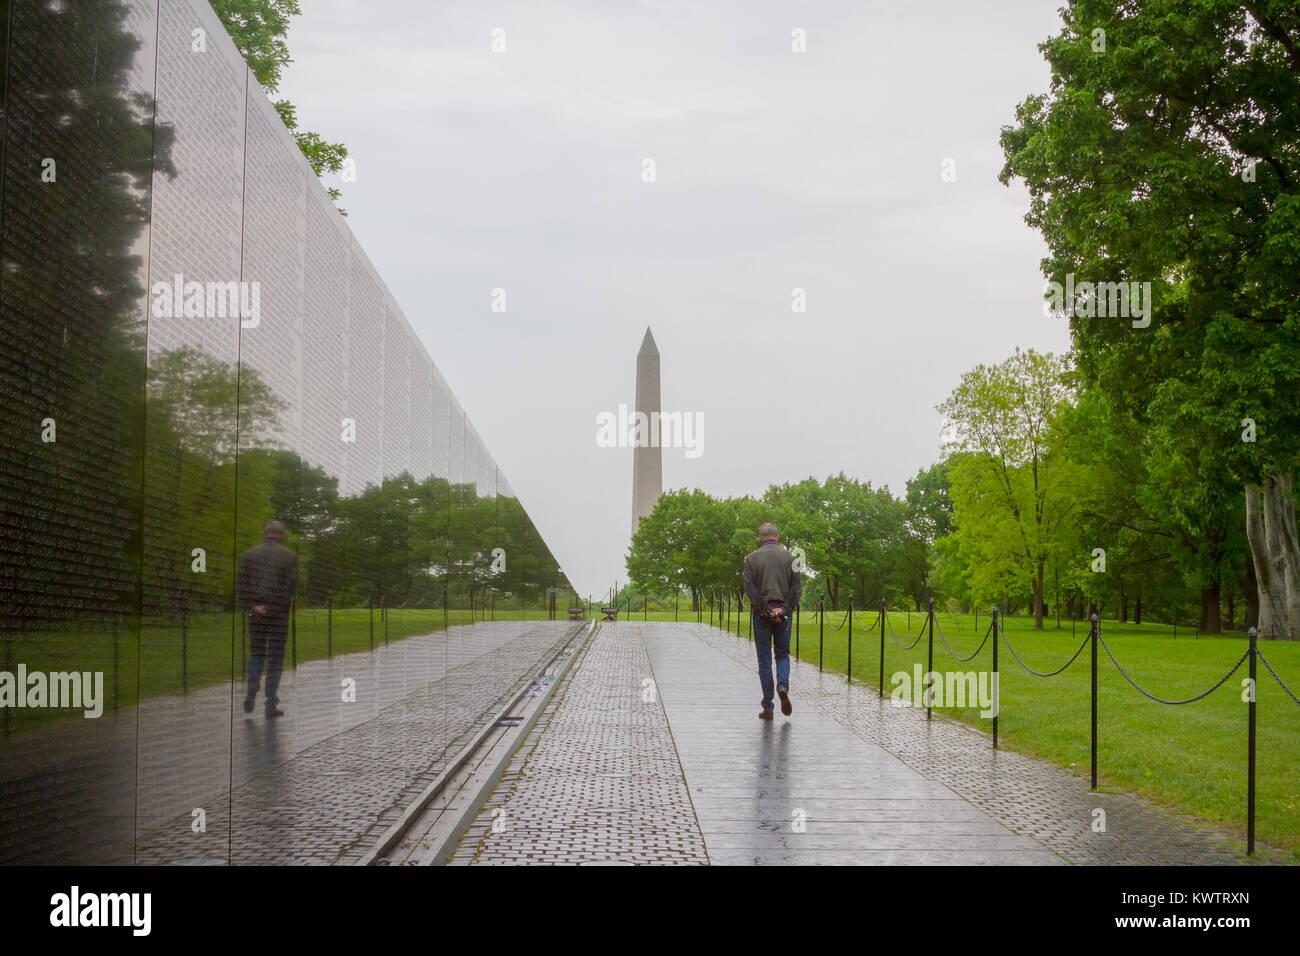 Attrayant Vietnam Veterans Memorial, In Washington DC, Vietnam Memorial Wall, Designed  By Maya Lin, Dedicated In 1982